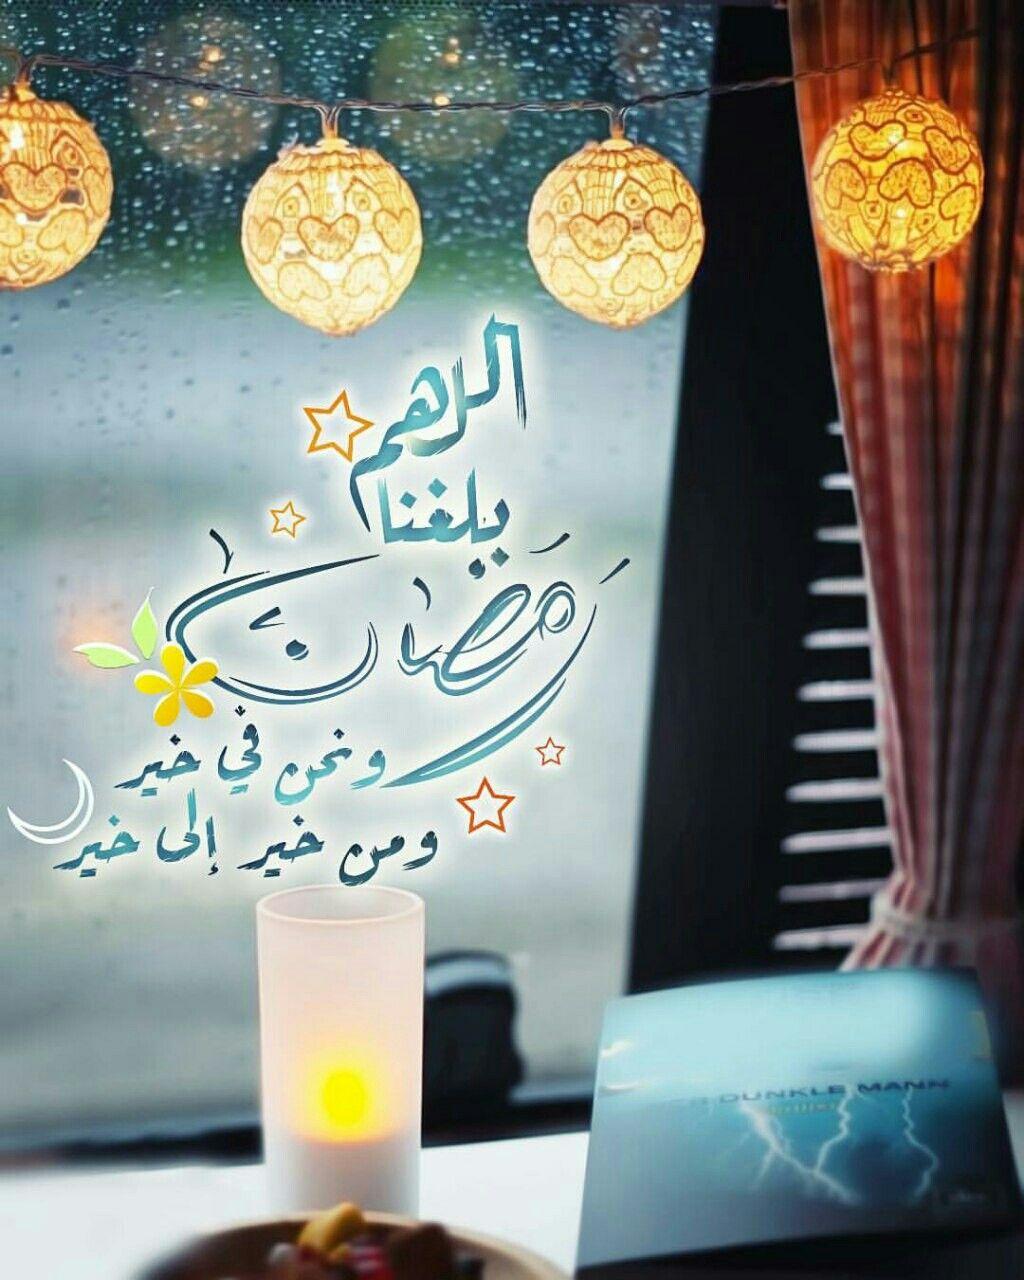 Pin By Abdalrhnen Ahmad On زهره Ramadan Crafts Ramadan Lantern Ramadan Quotes